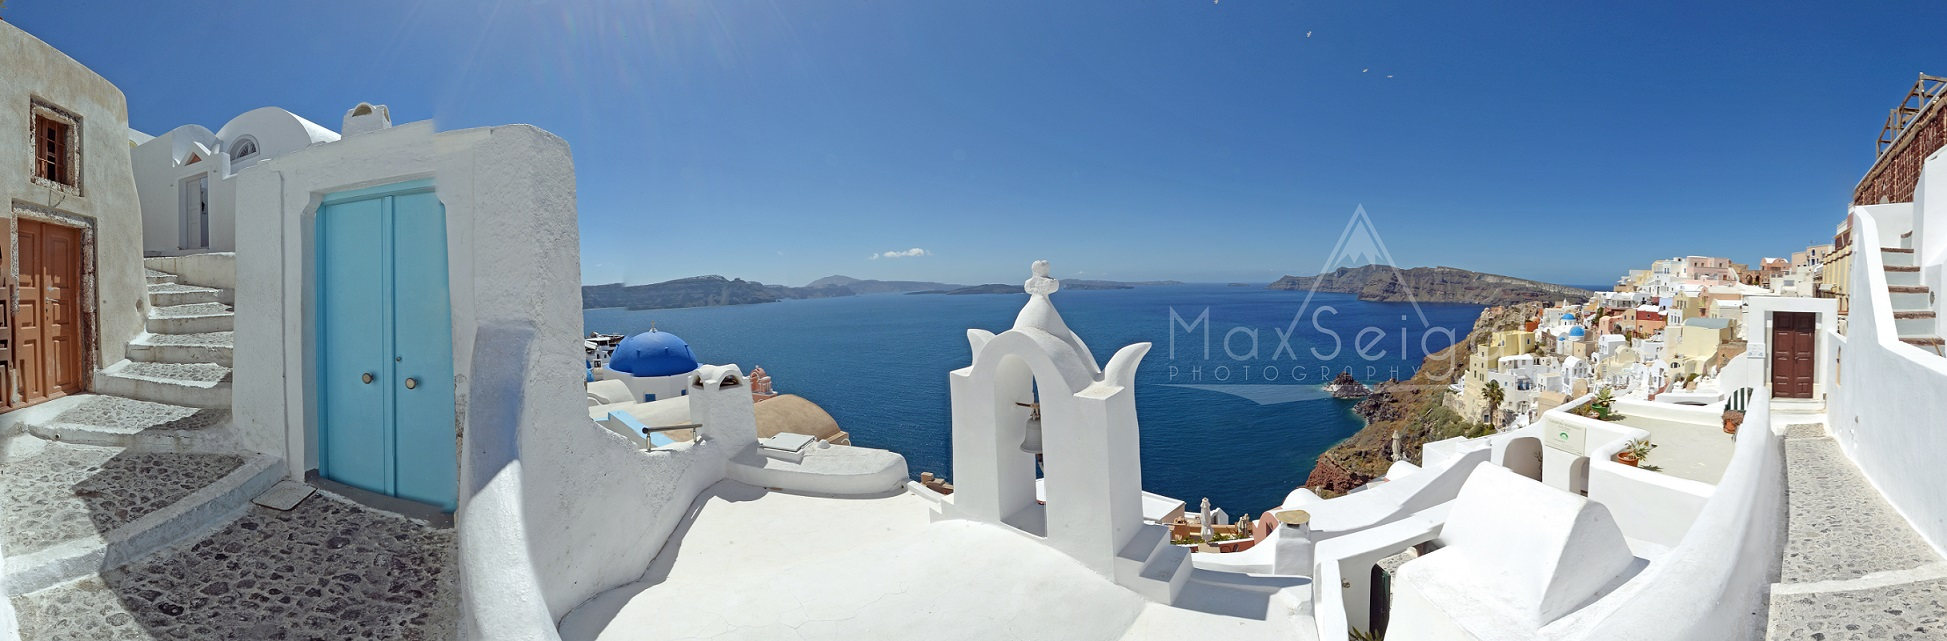 The amazing island of Santorini